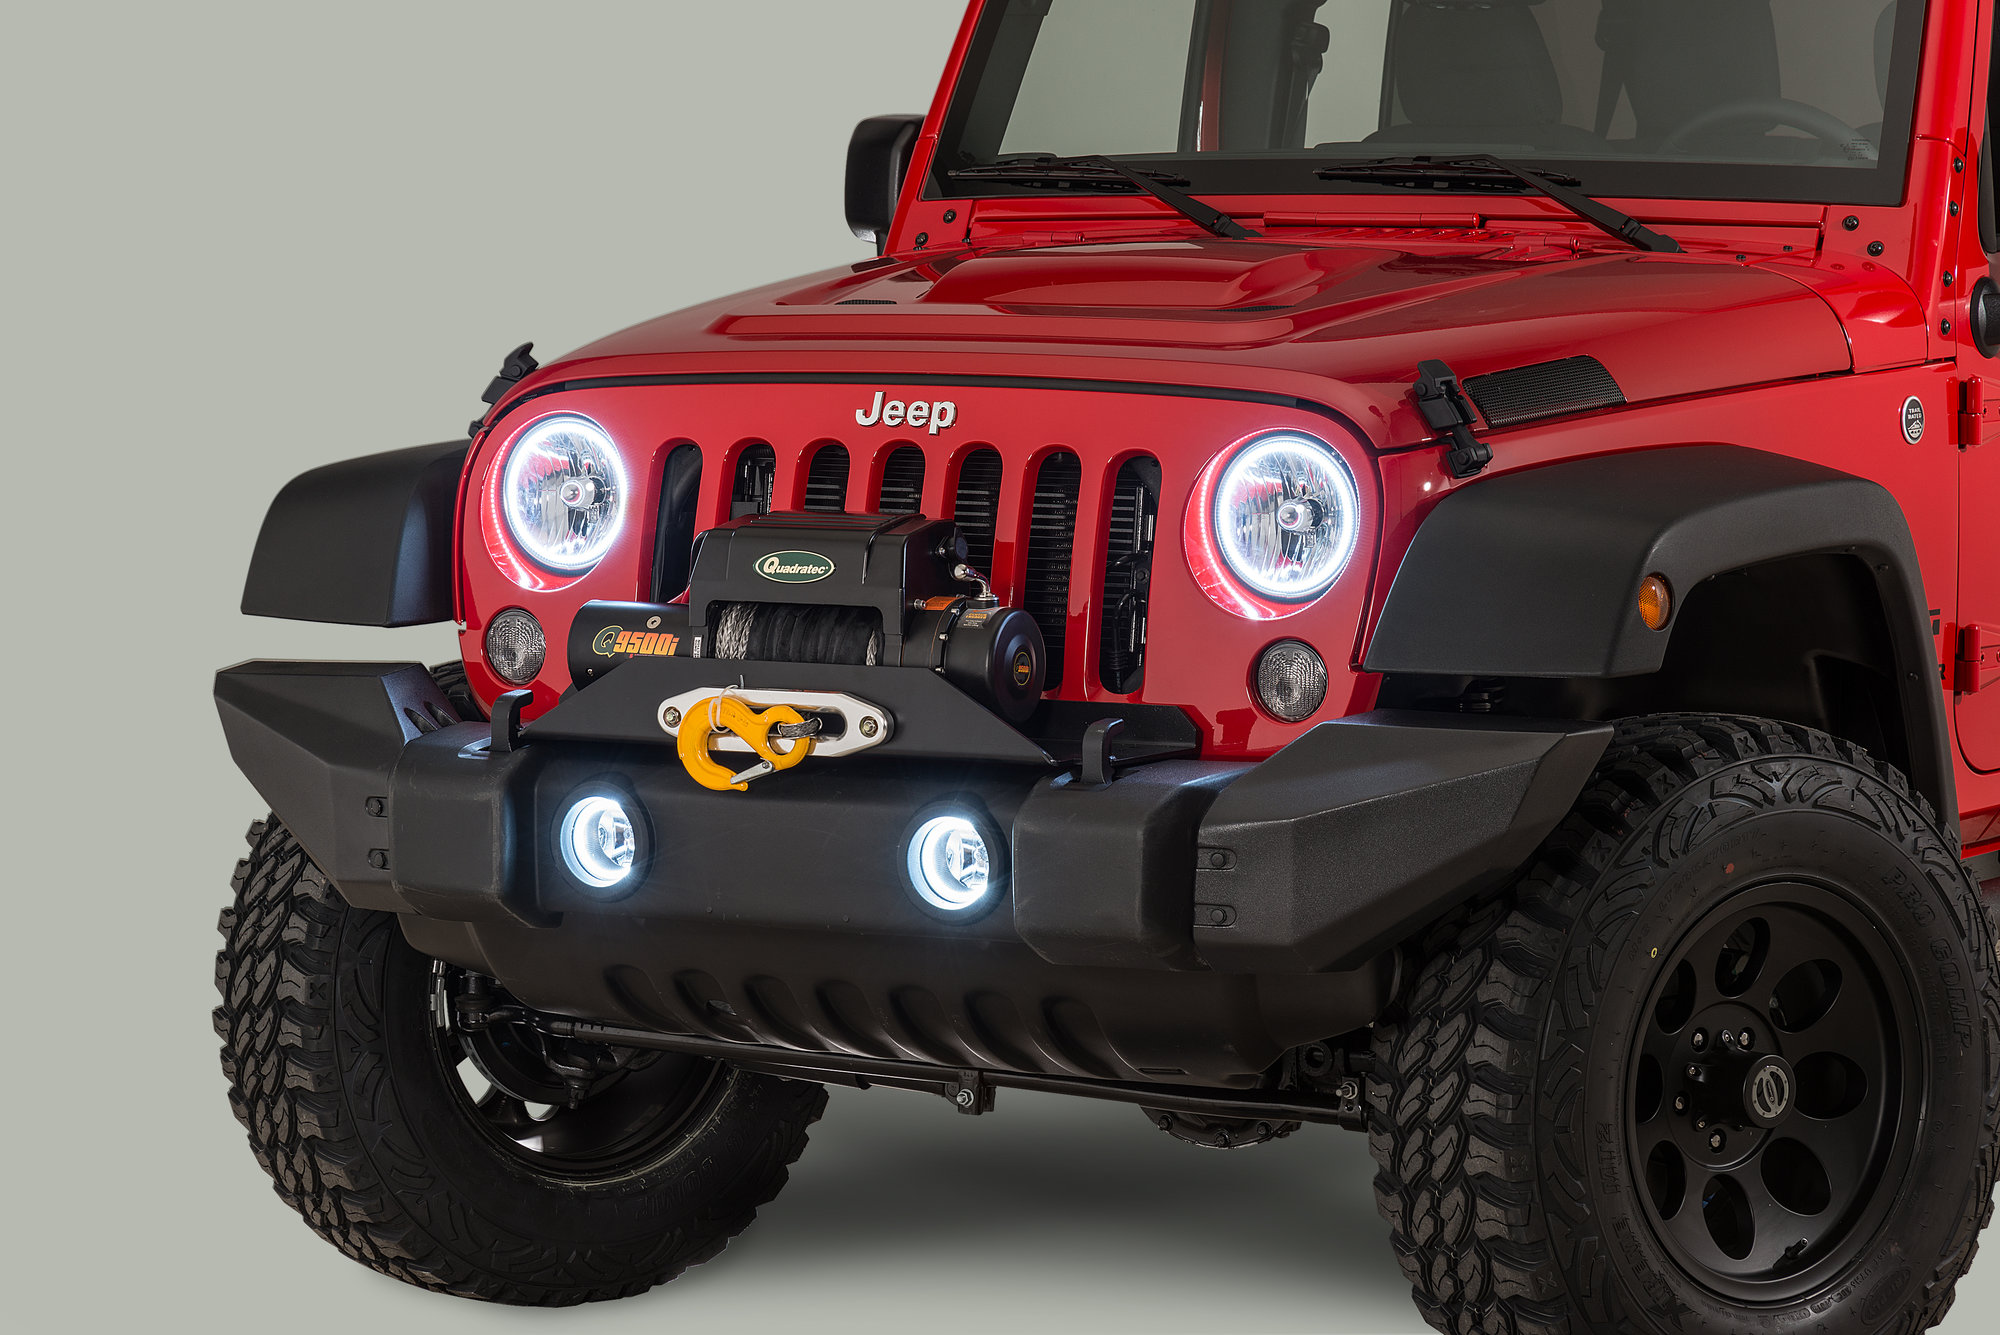 Jeep Commander Headlights